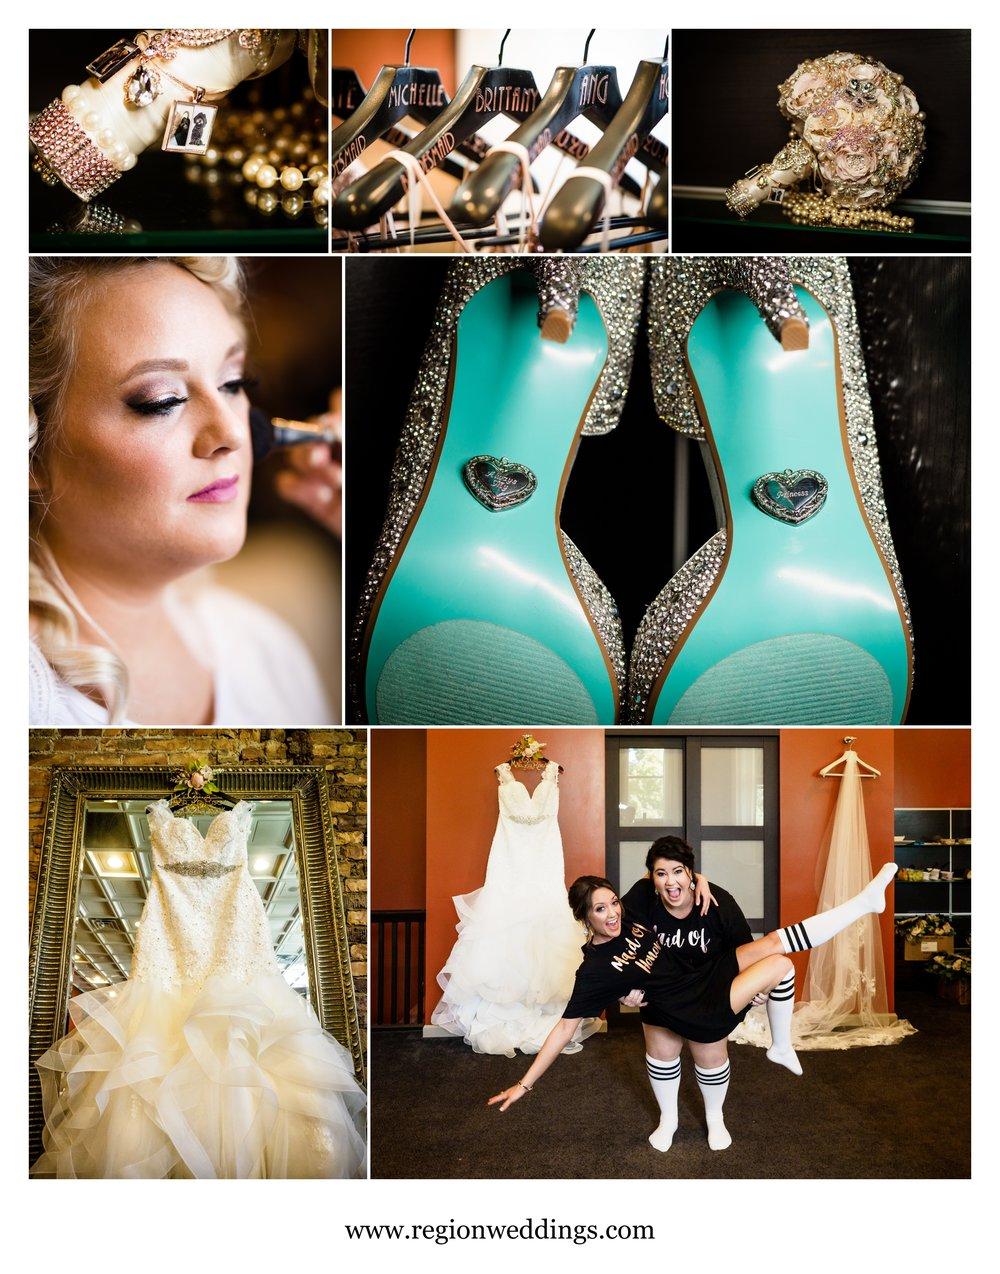 Bridal prep at The Allure in Laporte, Indiana.